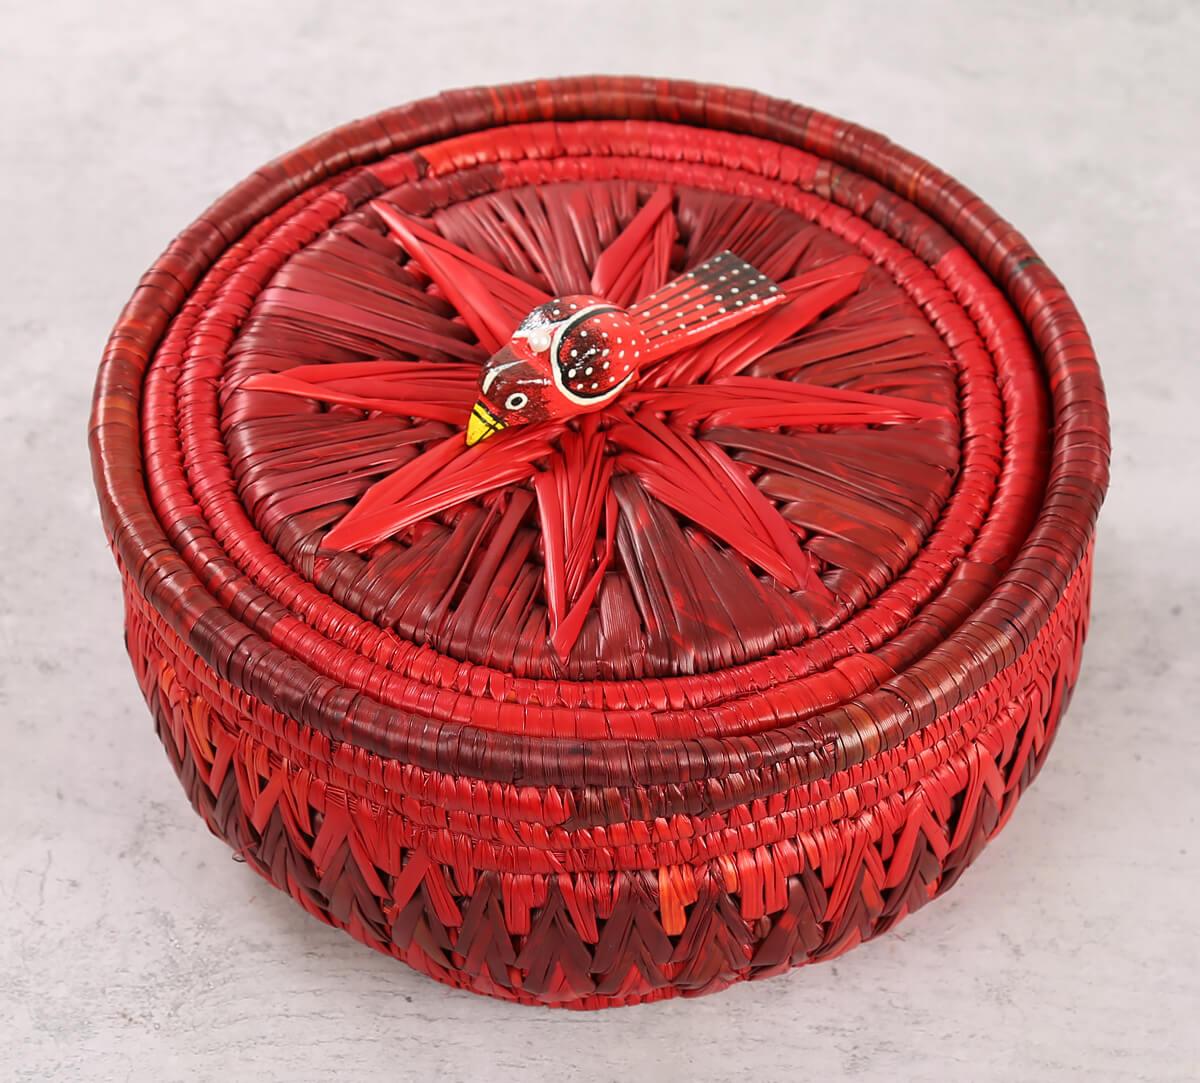 Badohi Hand Woven Scarlet Basket